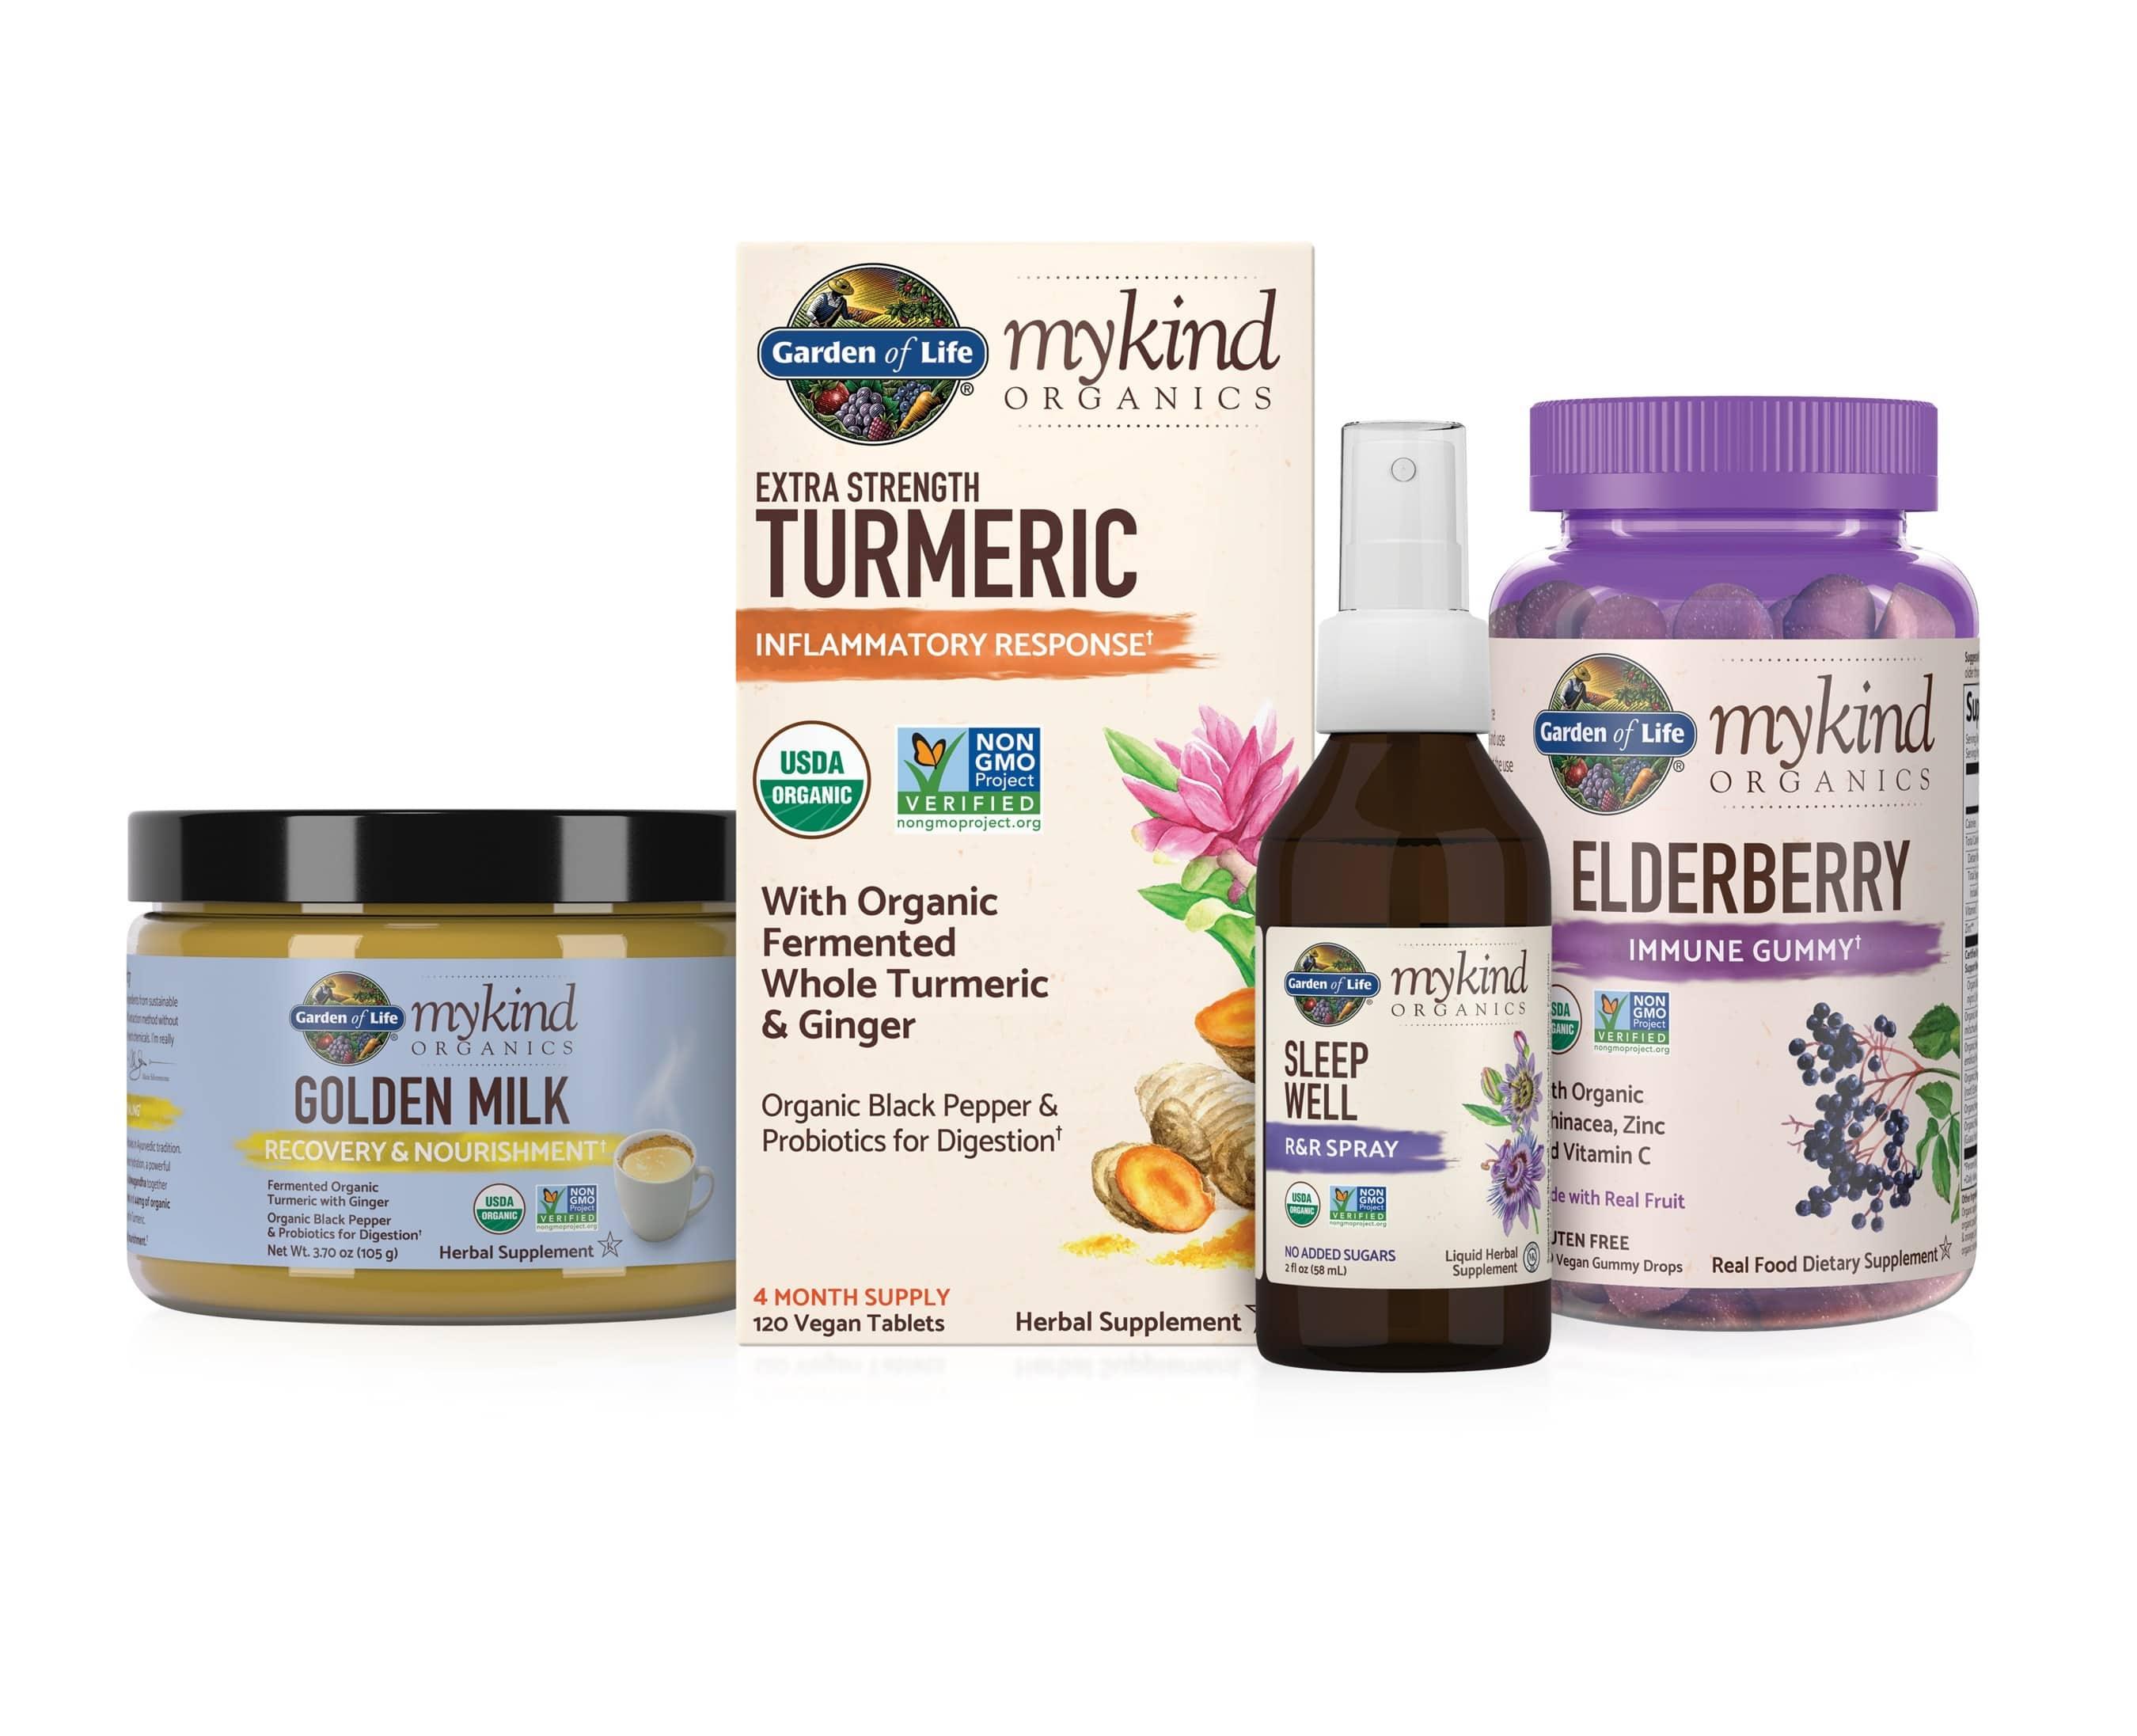 Garden of Life and Alicia Silverstone Launch mykind Organics Herbals